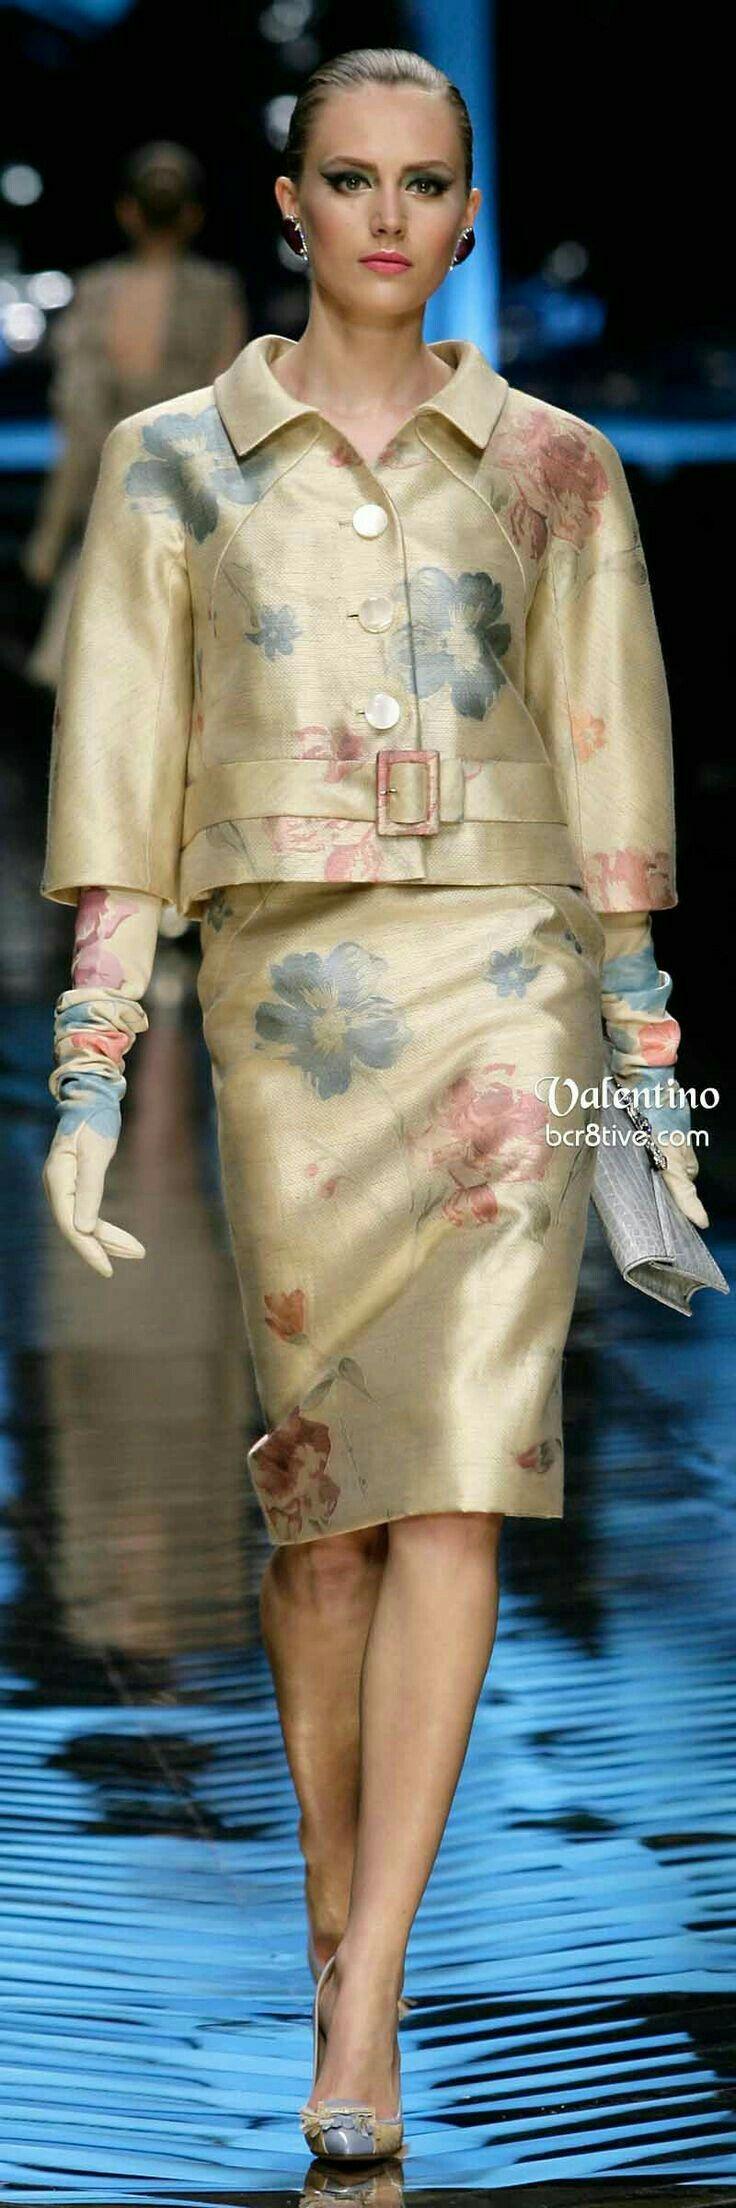 803 Best Blouse Images On Pinterest Feminine Fashion And Atasan Raya Beige Shop At Velvet Valentino Beautiful